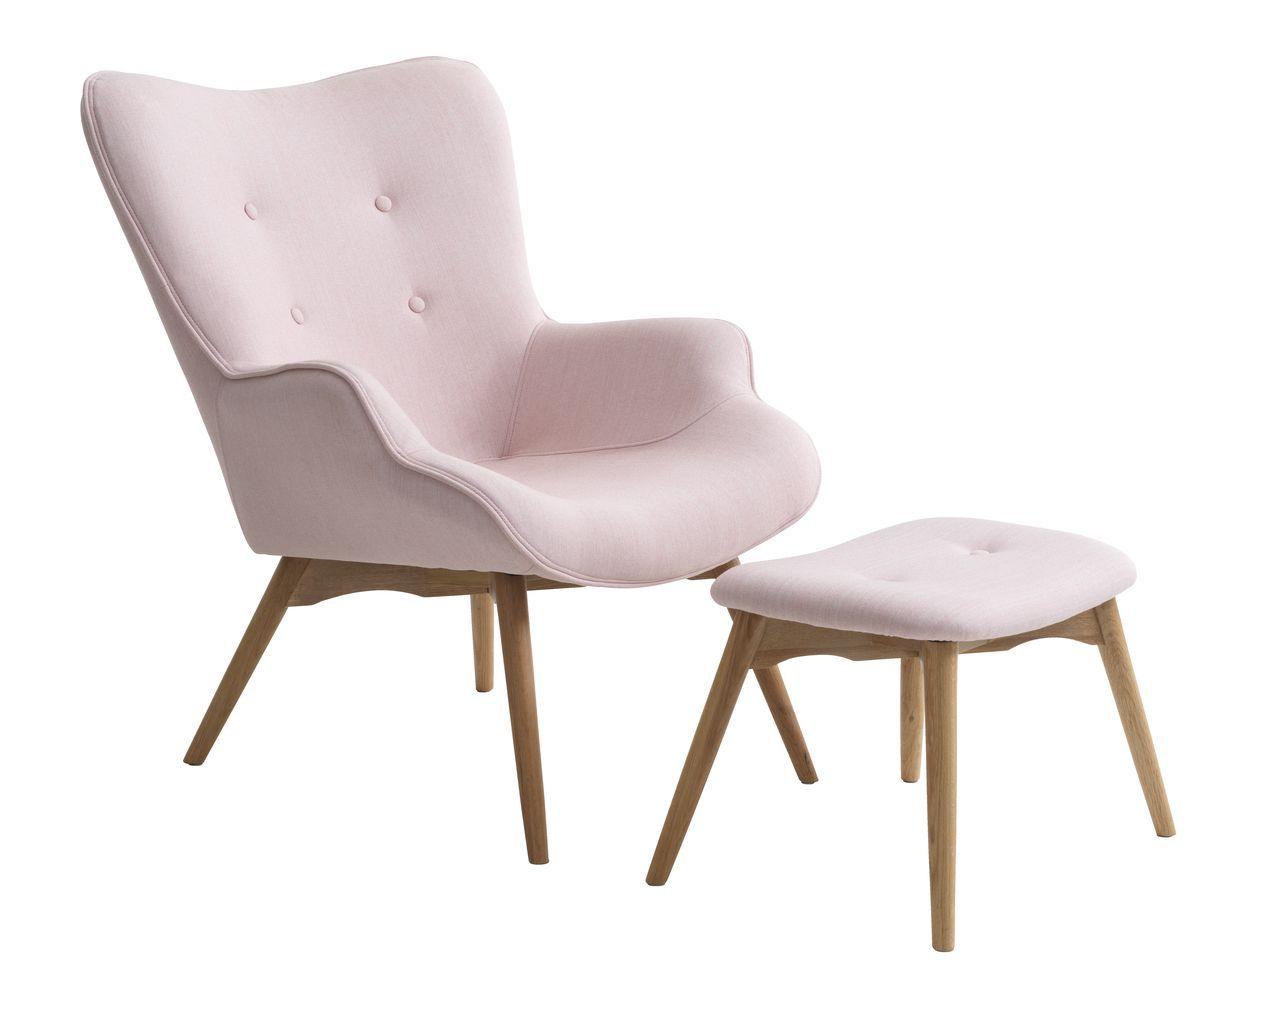 fauteuil mvoetenbank petersborg roze  jysk  arm chairs